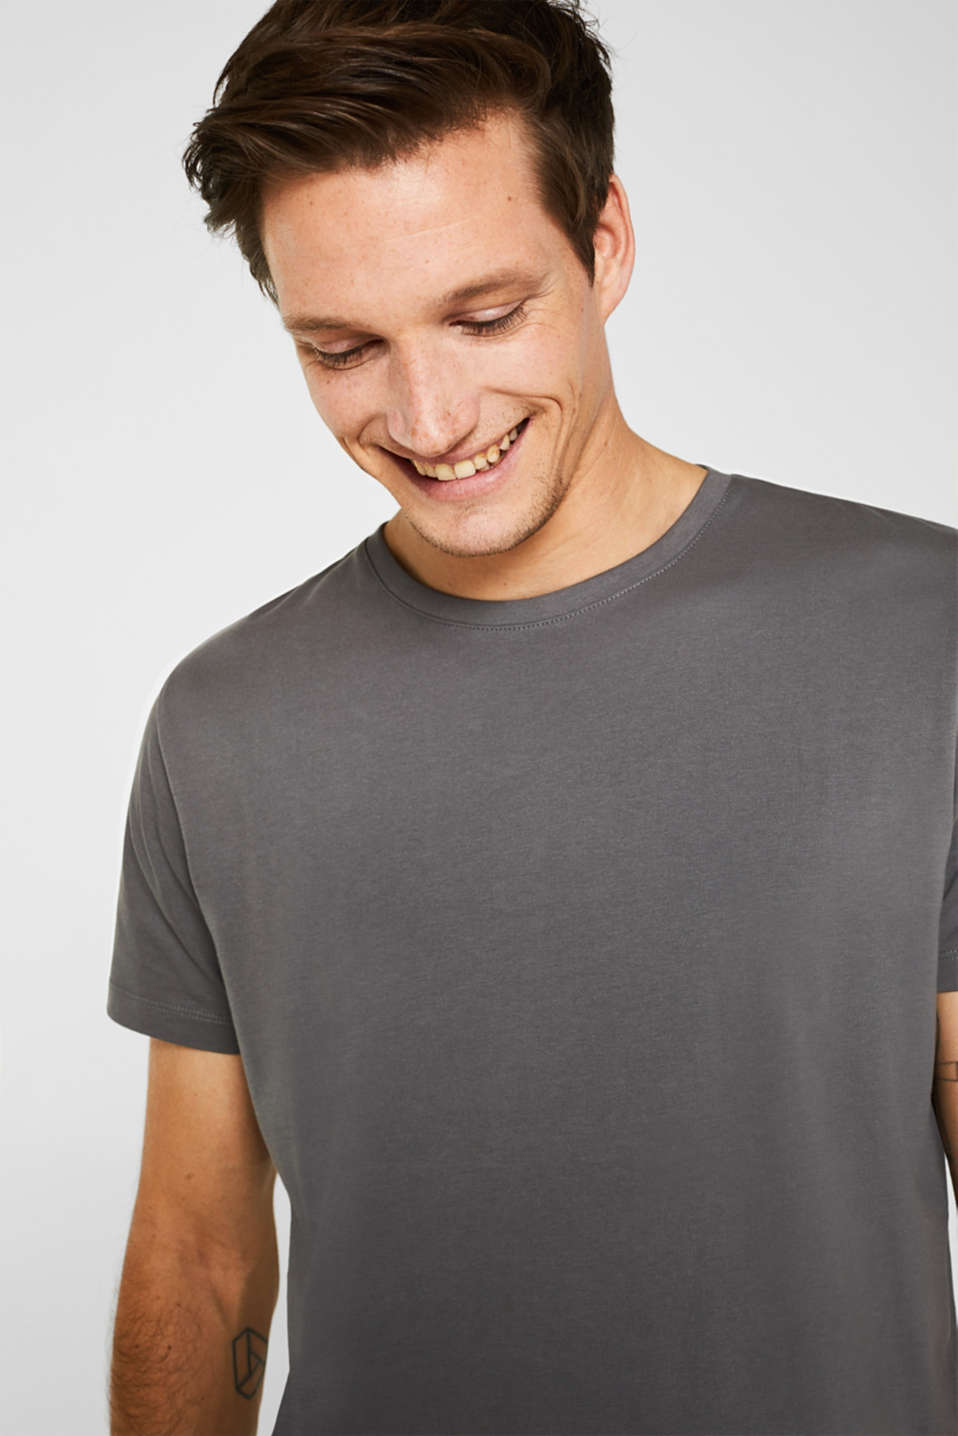 Jersey T-shirt in 100% cotton, DARK GREY, detail image number 6